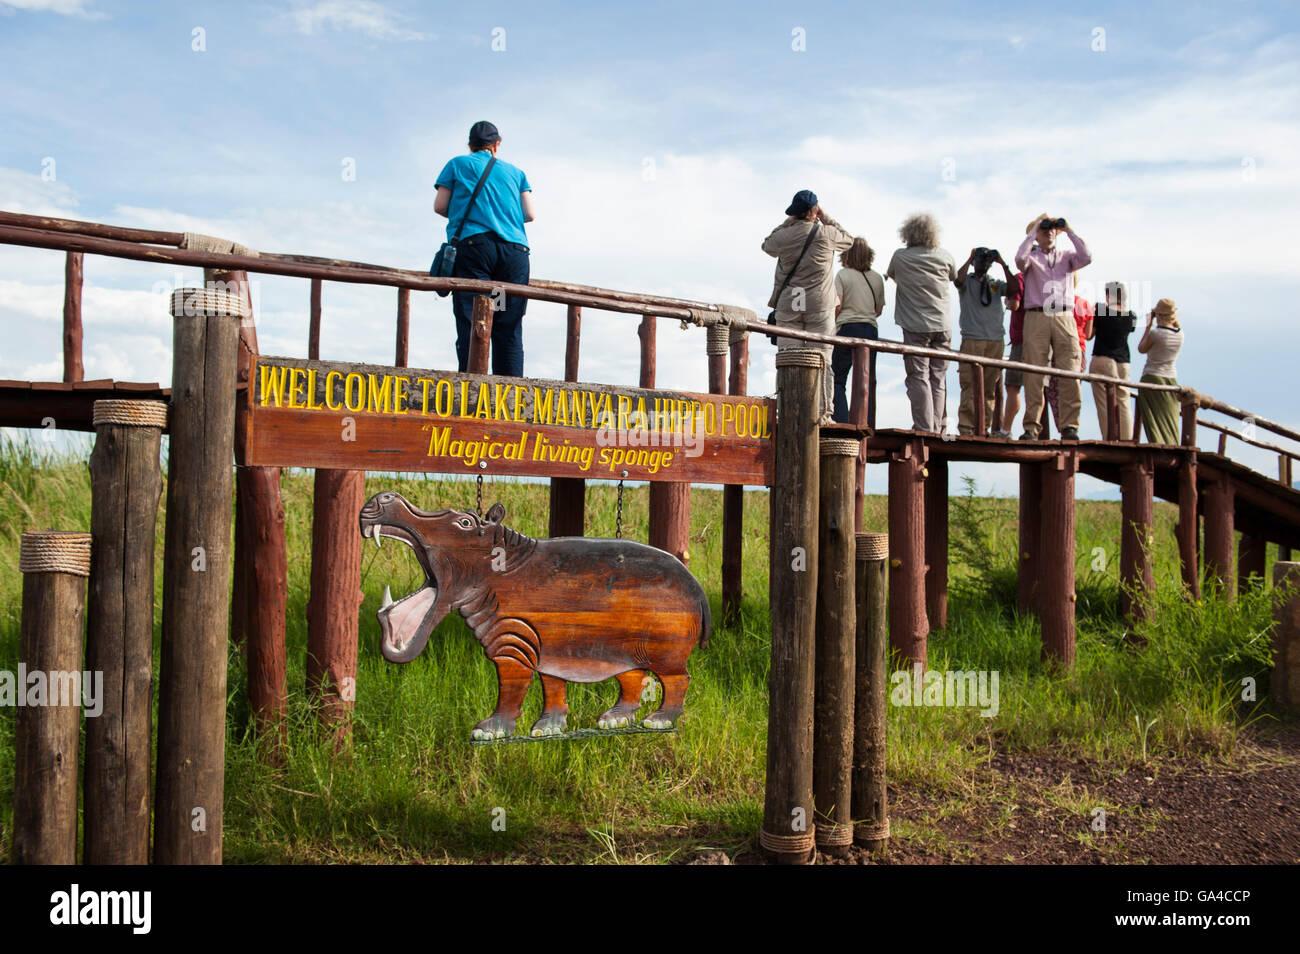 Tourists overlooking the hippo pool, Lake Manyara National Park, Tanzania - Stock Image